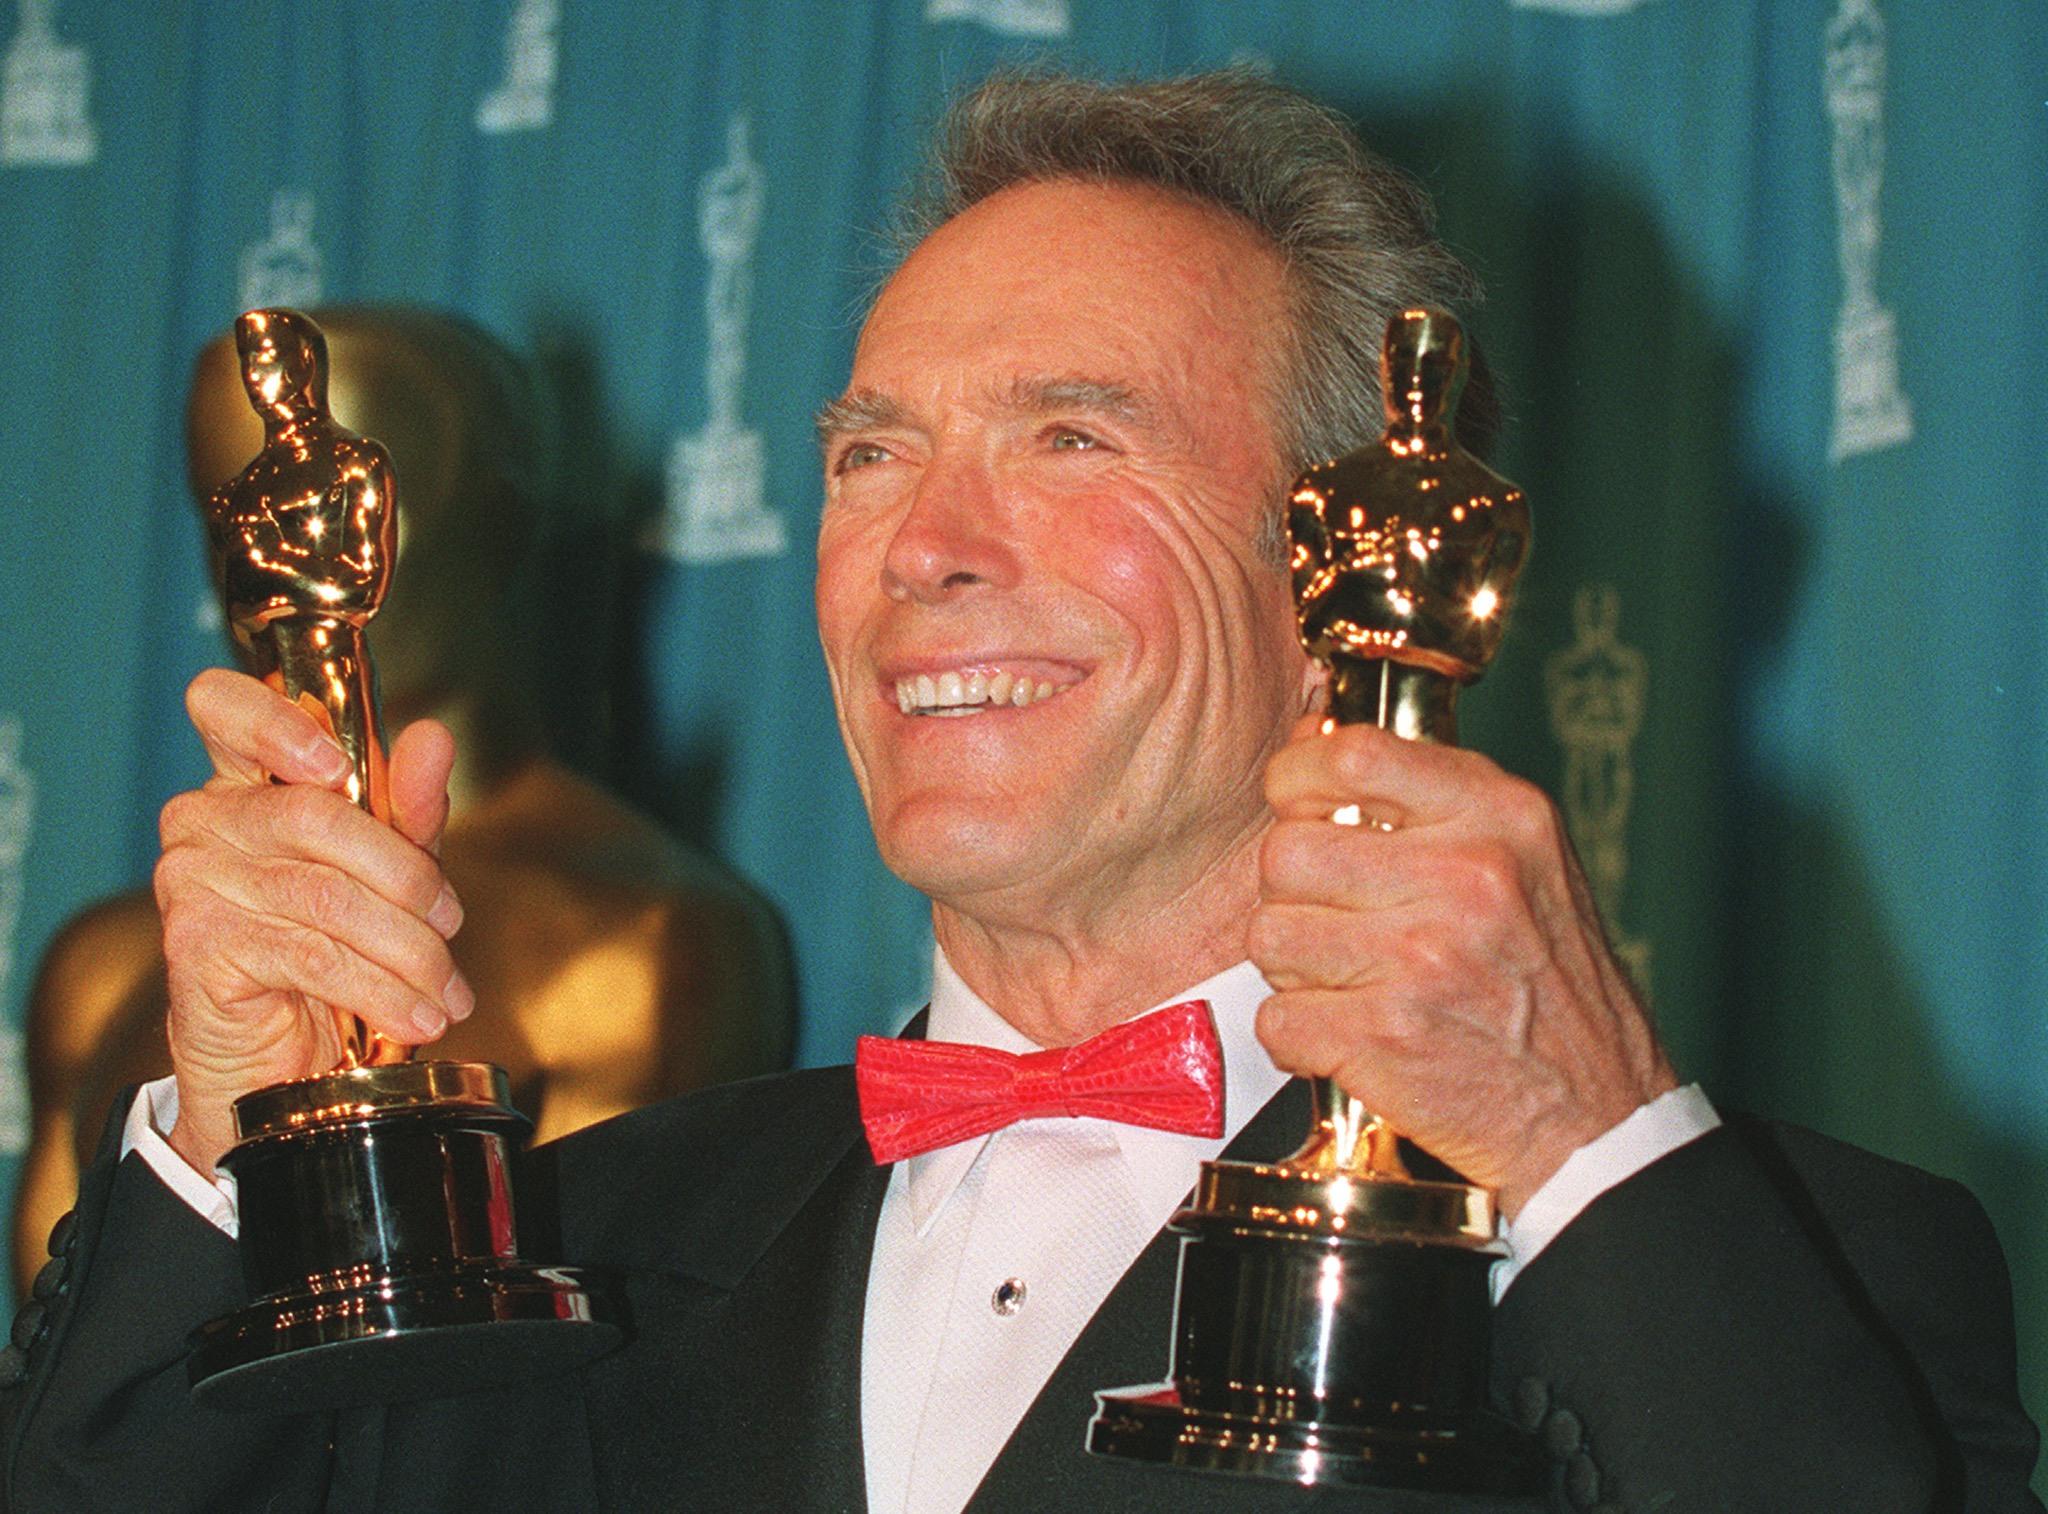 Actor/director Clint Eastwood